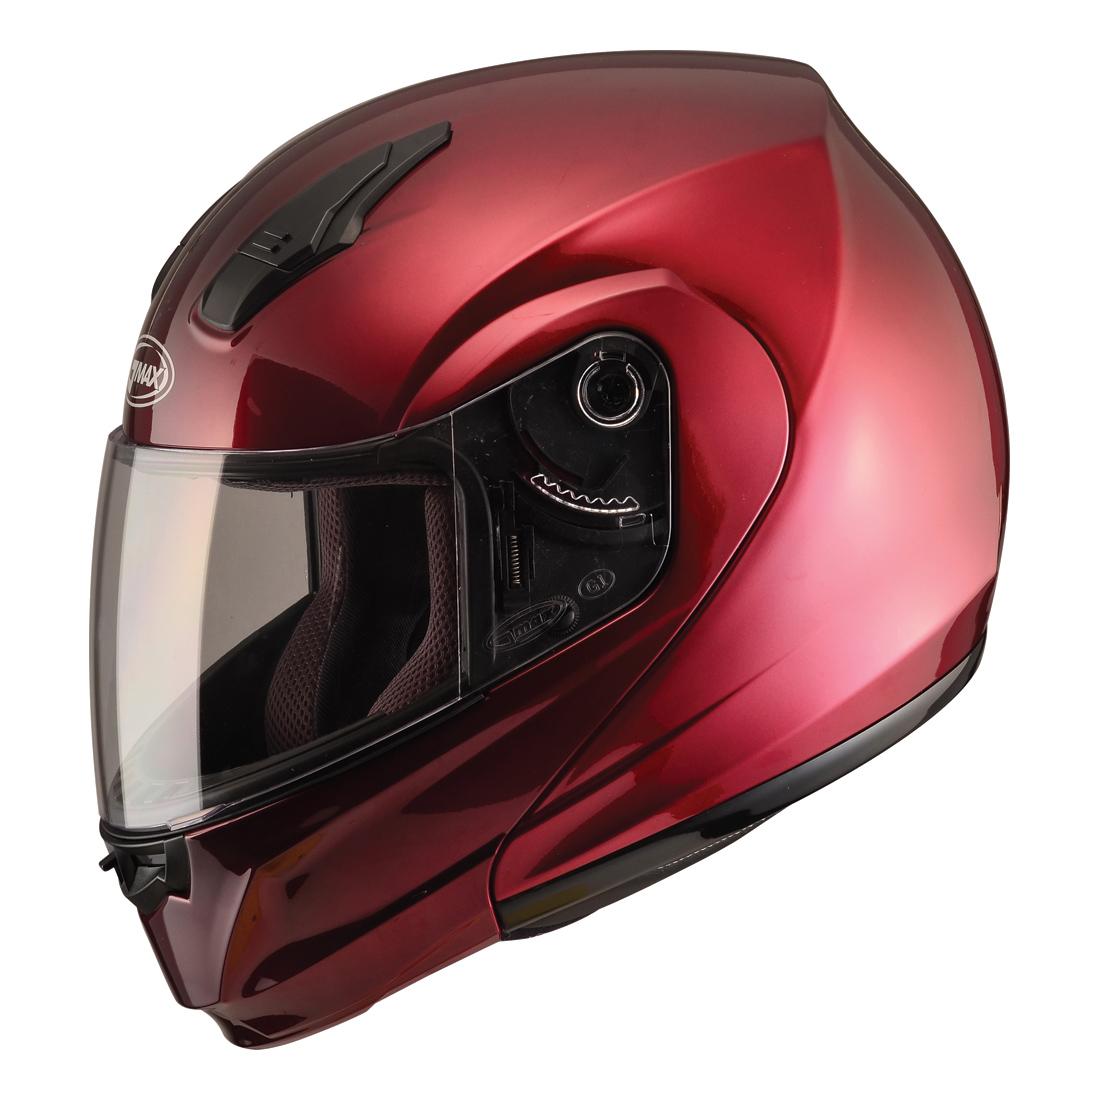 GMAX MD04 Wine Red Modular Helmet